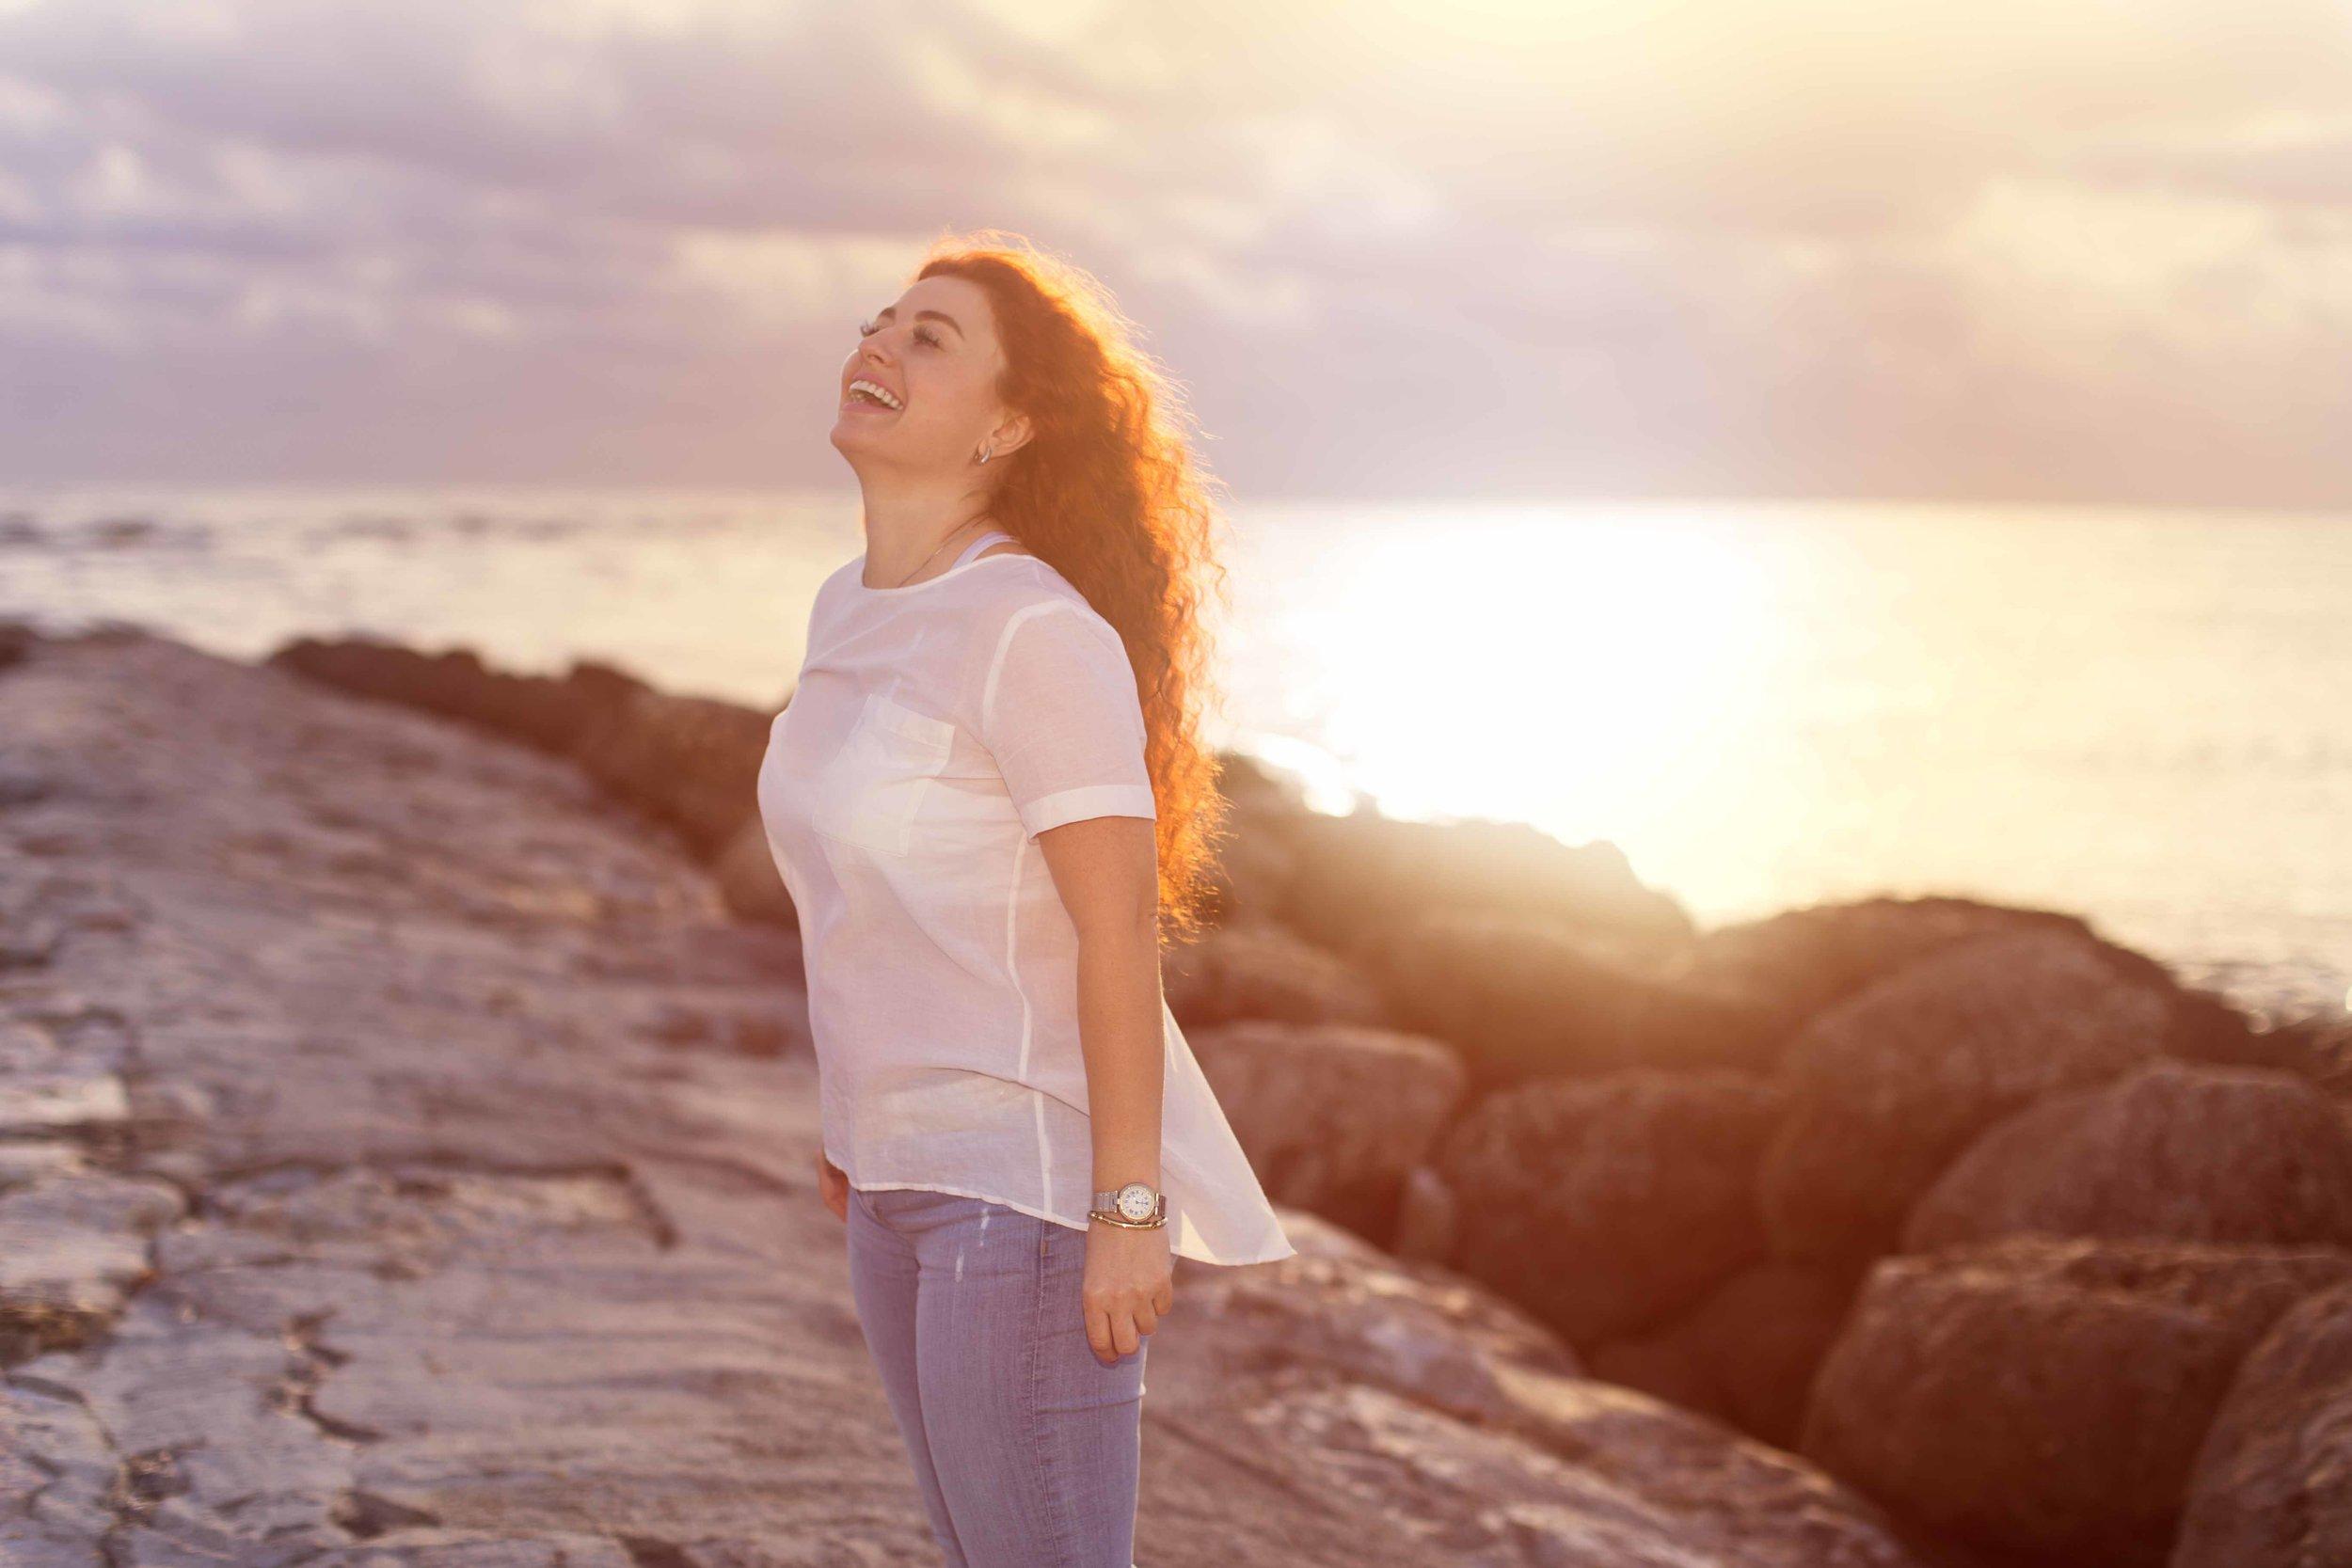 personal-branding-photography-female-entrepreneur-ocean-photoshoot-sunrise-boca-raton-south-florida